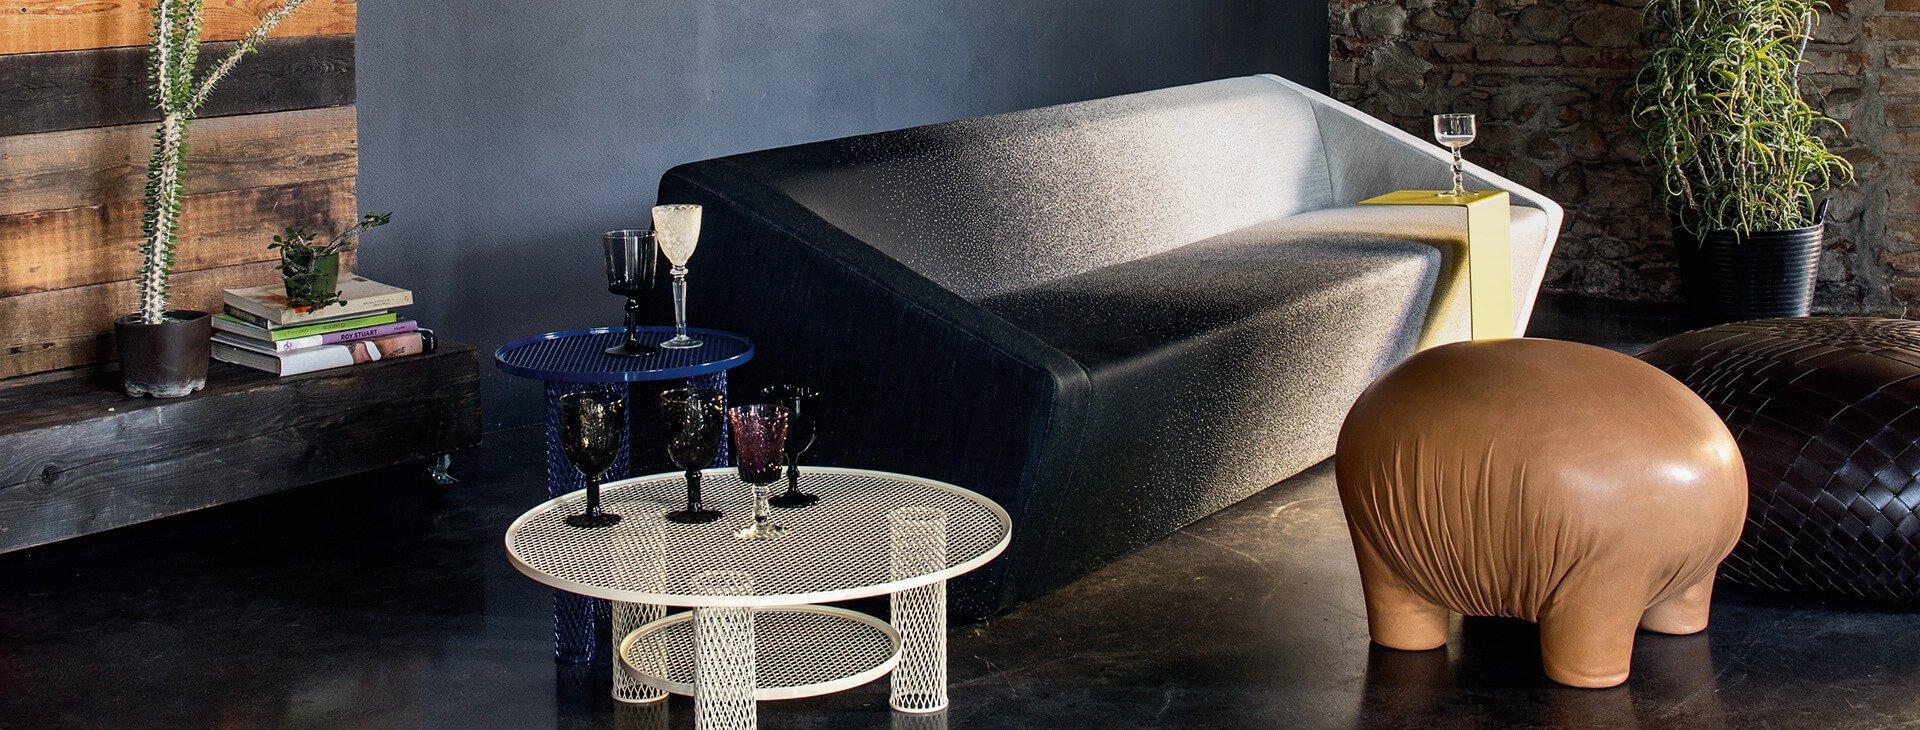 moroso ihre brands im stilwerk berlin. Black Bedroom Furniture Sets. Home Design Ideas